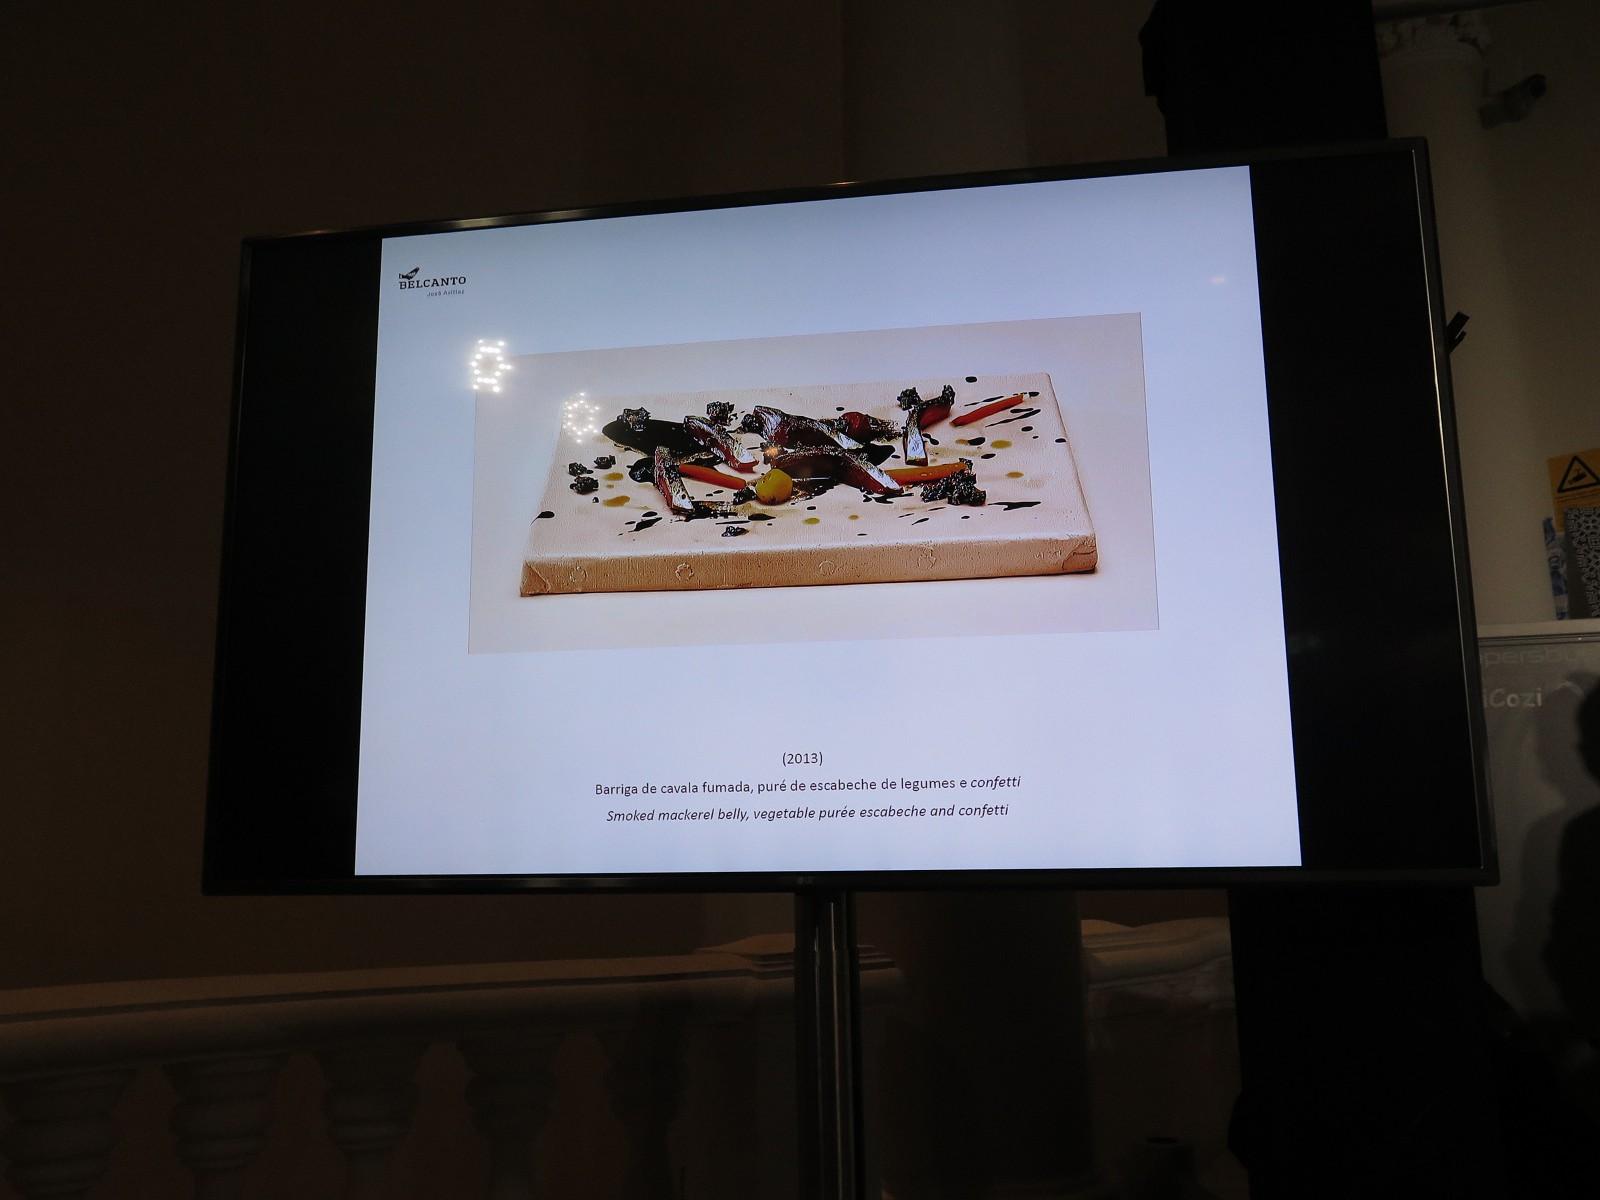 Barriga de cavala fumada, puré de escabeche de legumes e confetti (2013)